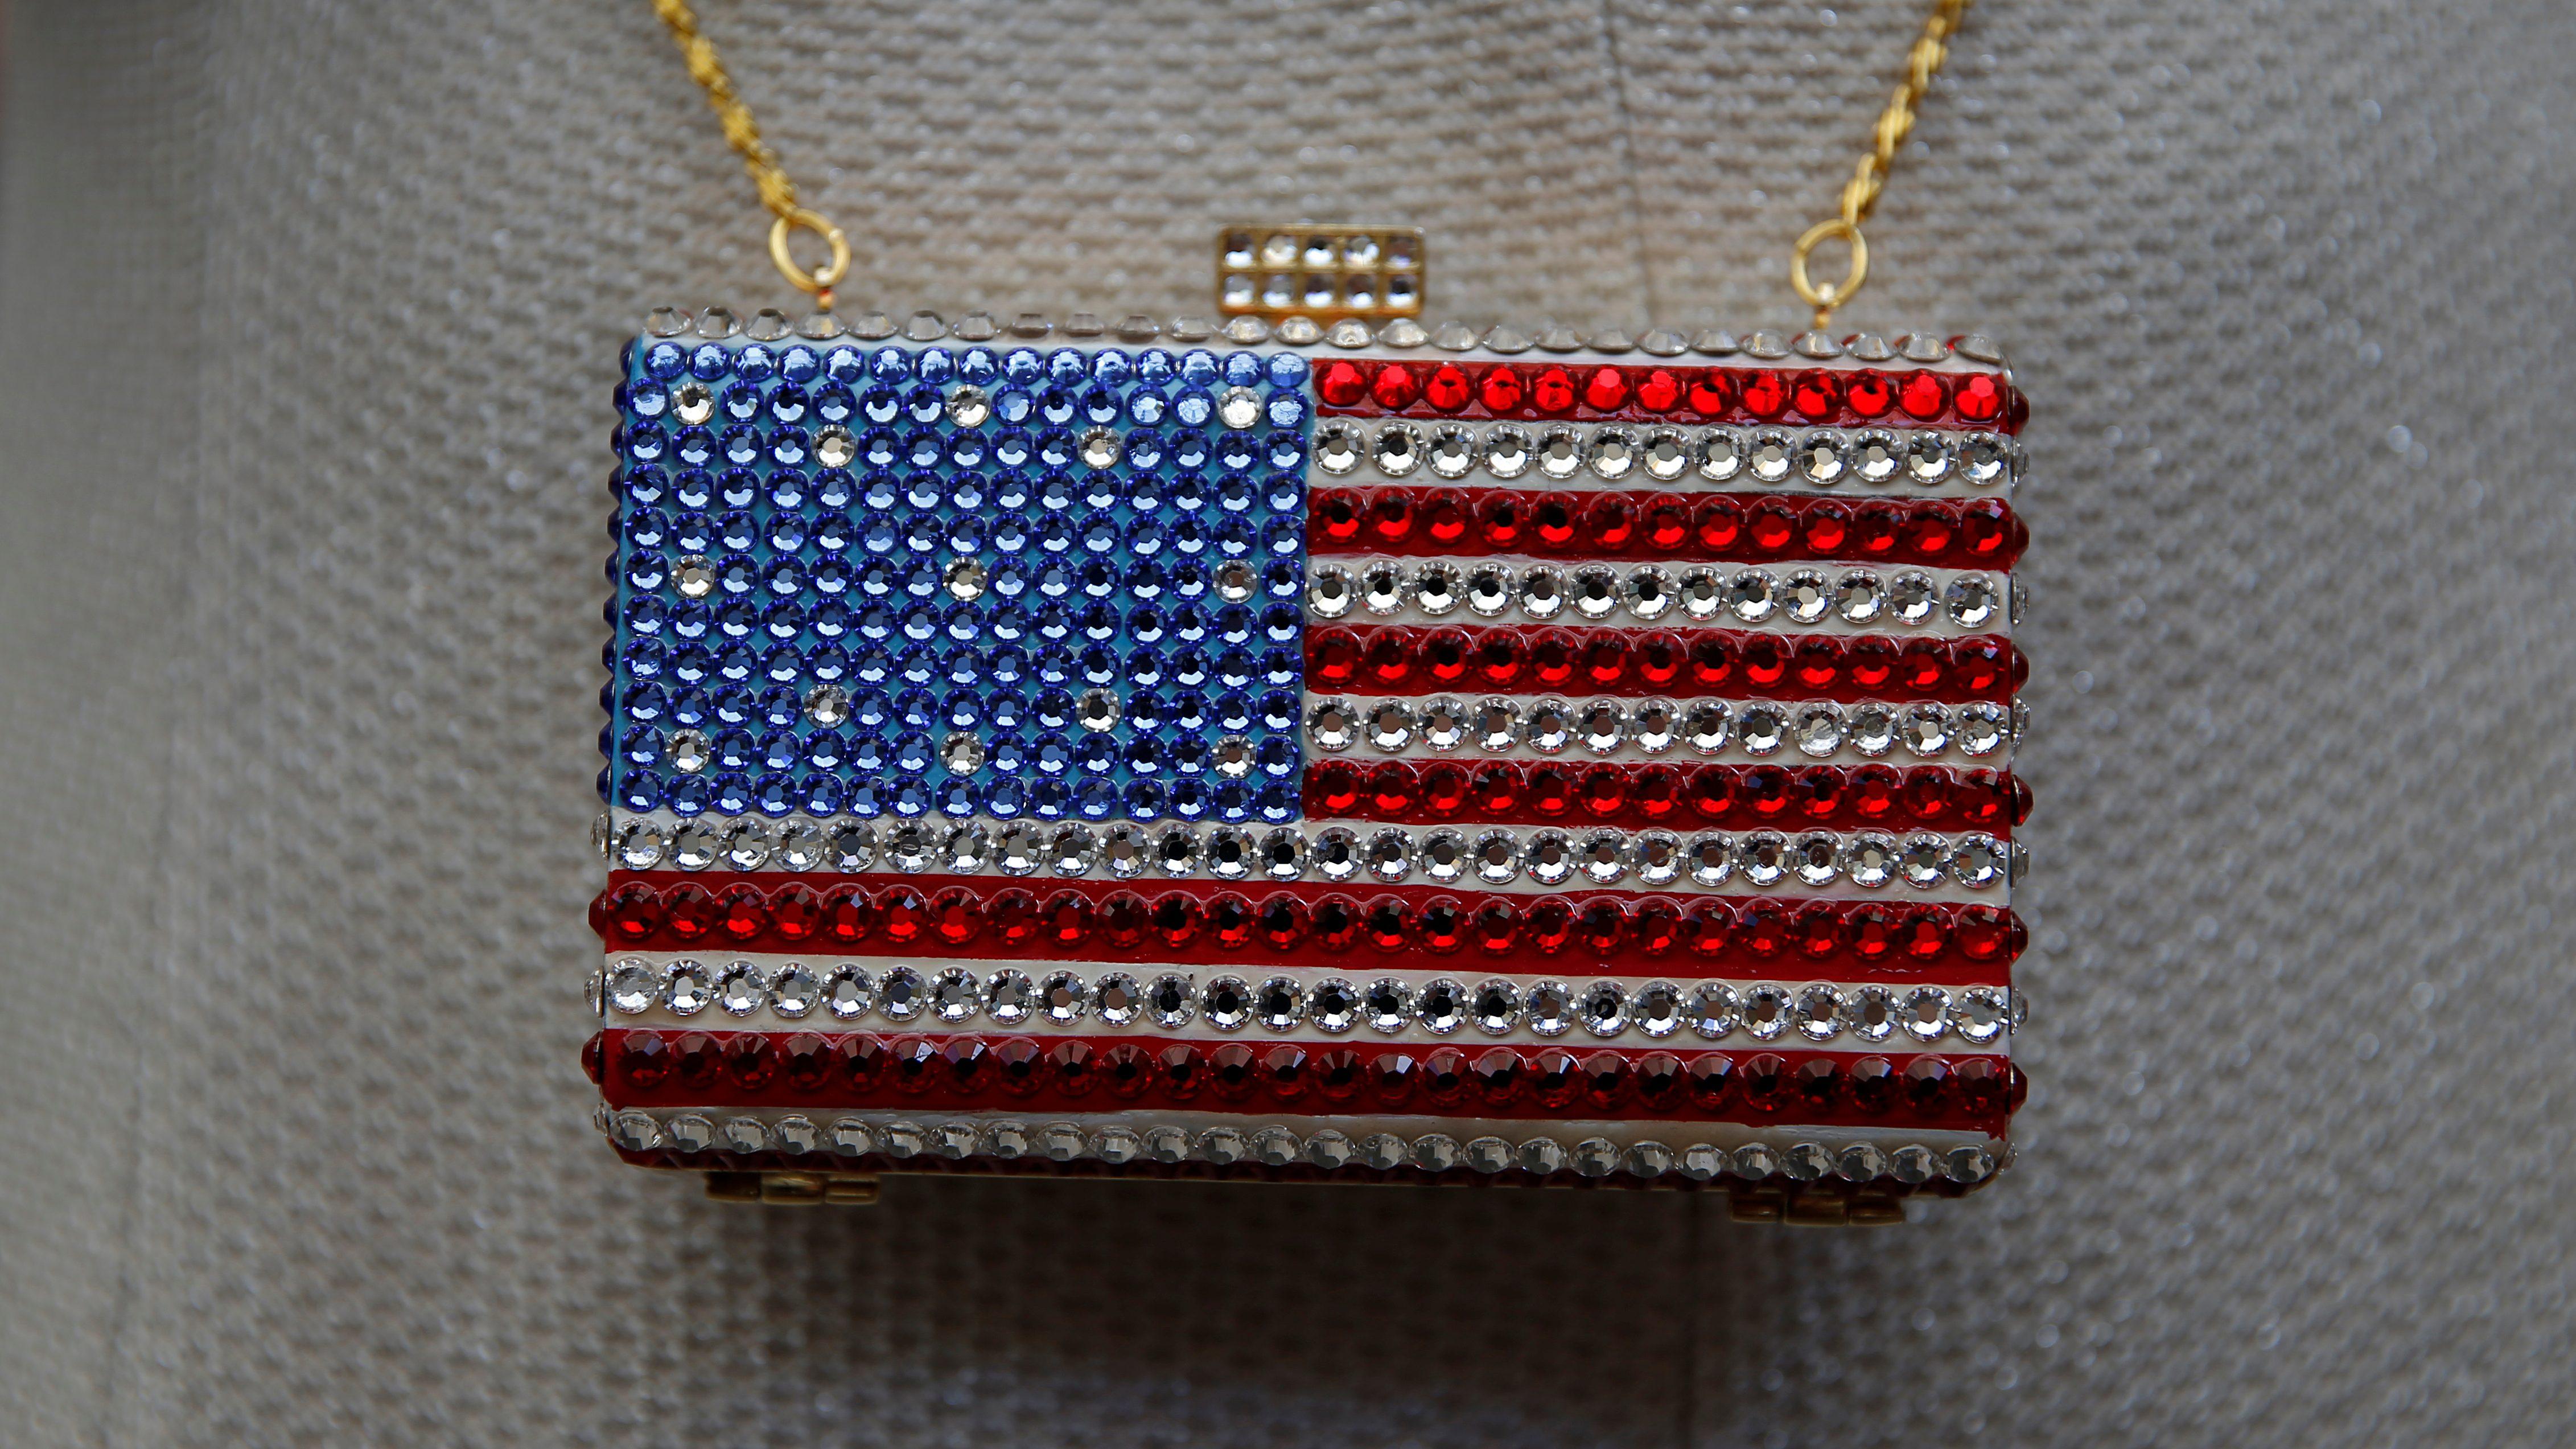 An American-flag themed purse.